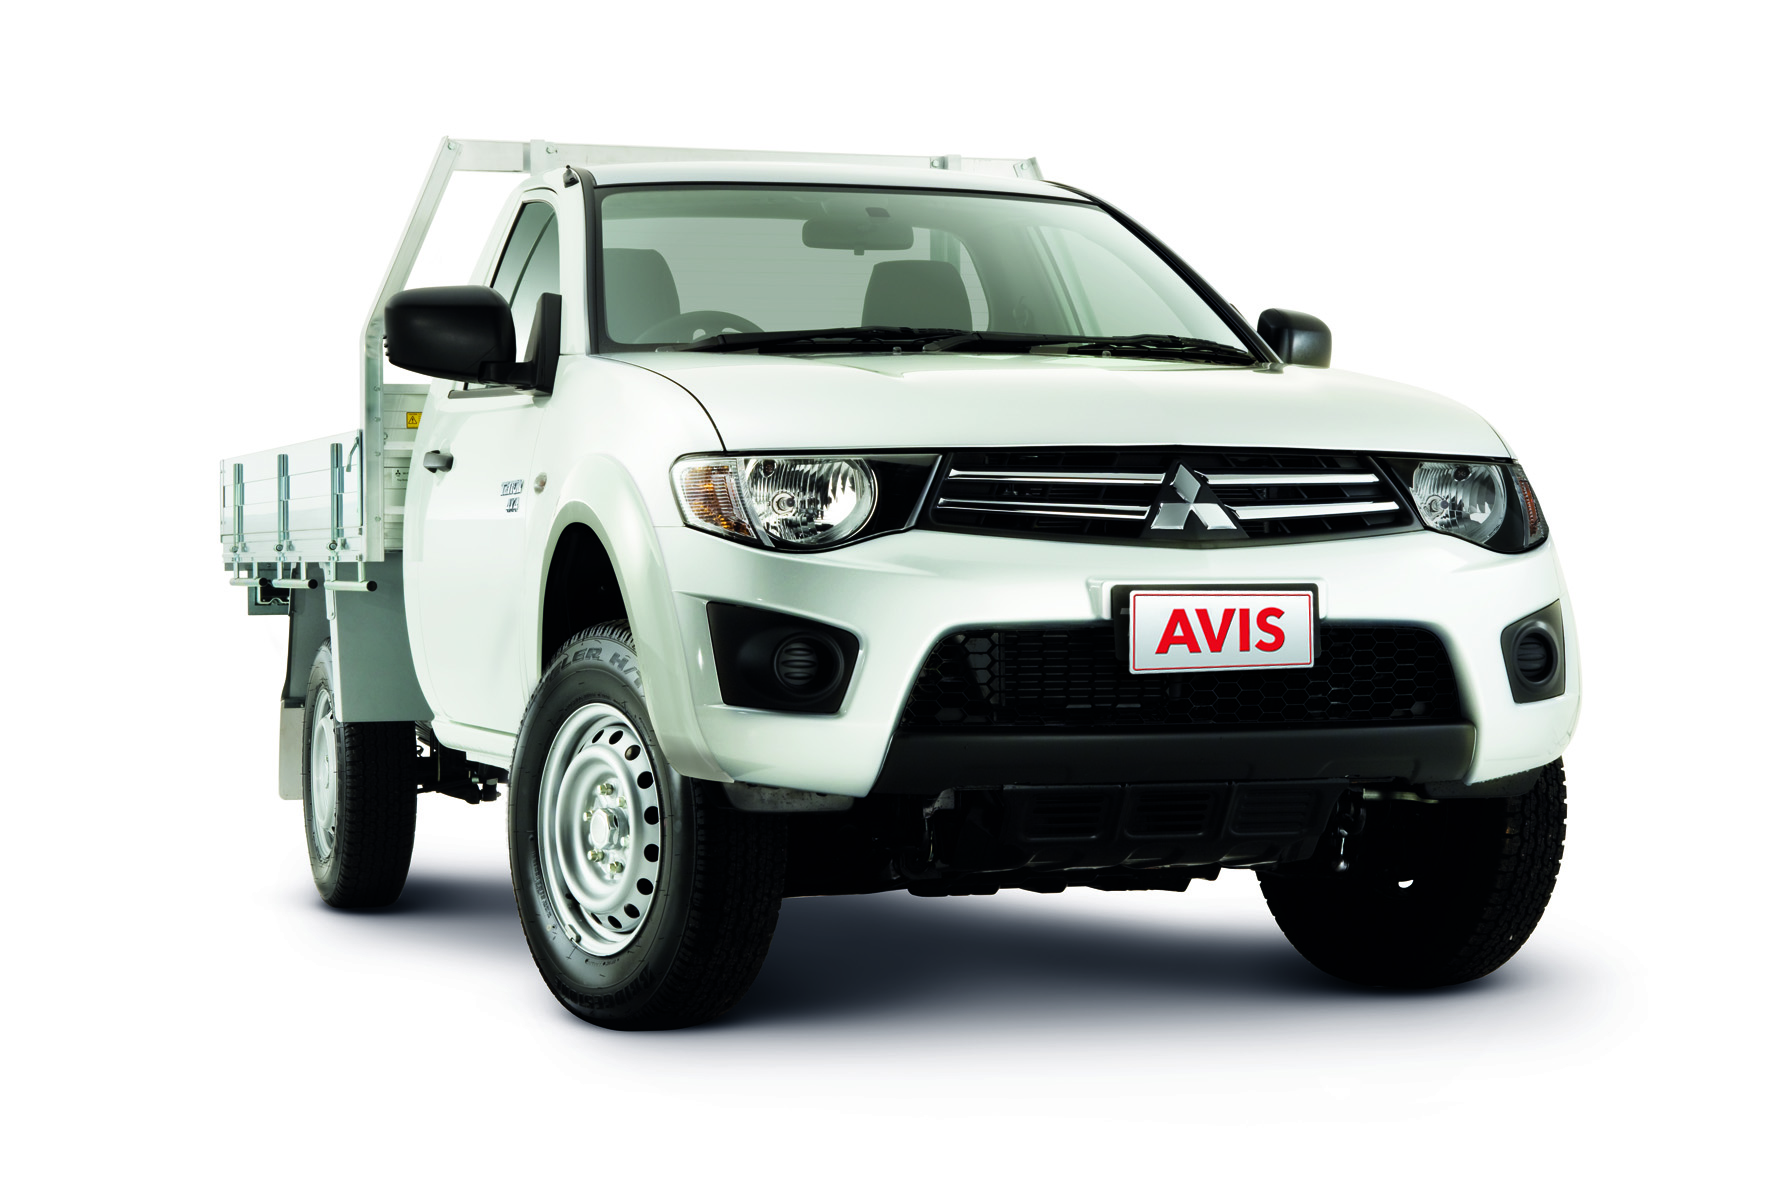 Avis Travel Agents And Wholesalers Avis Group C Mpnd 4 4